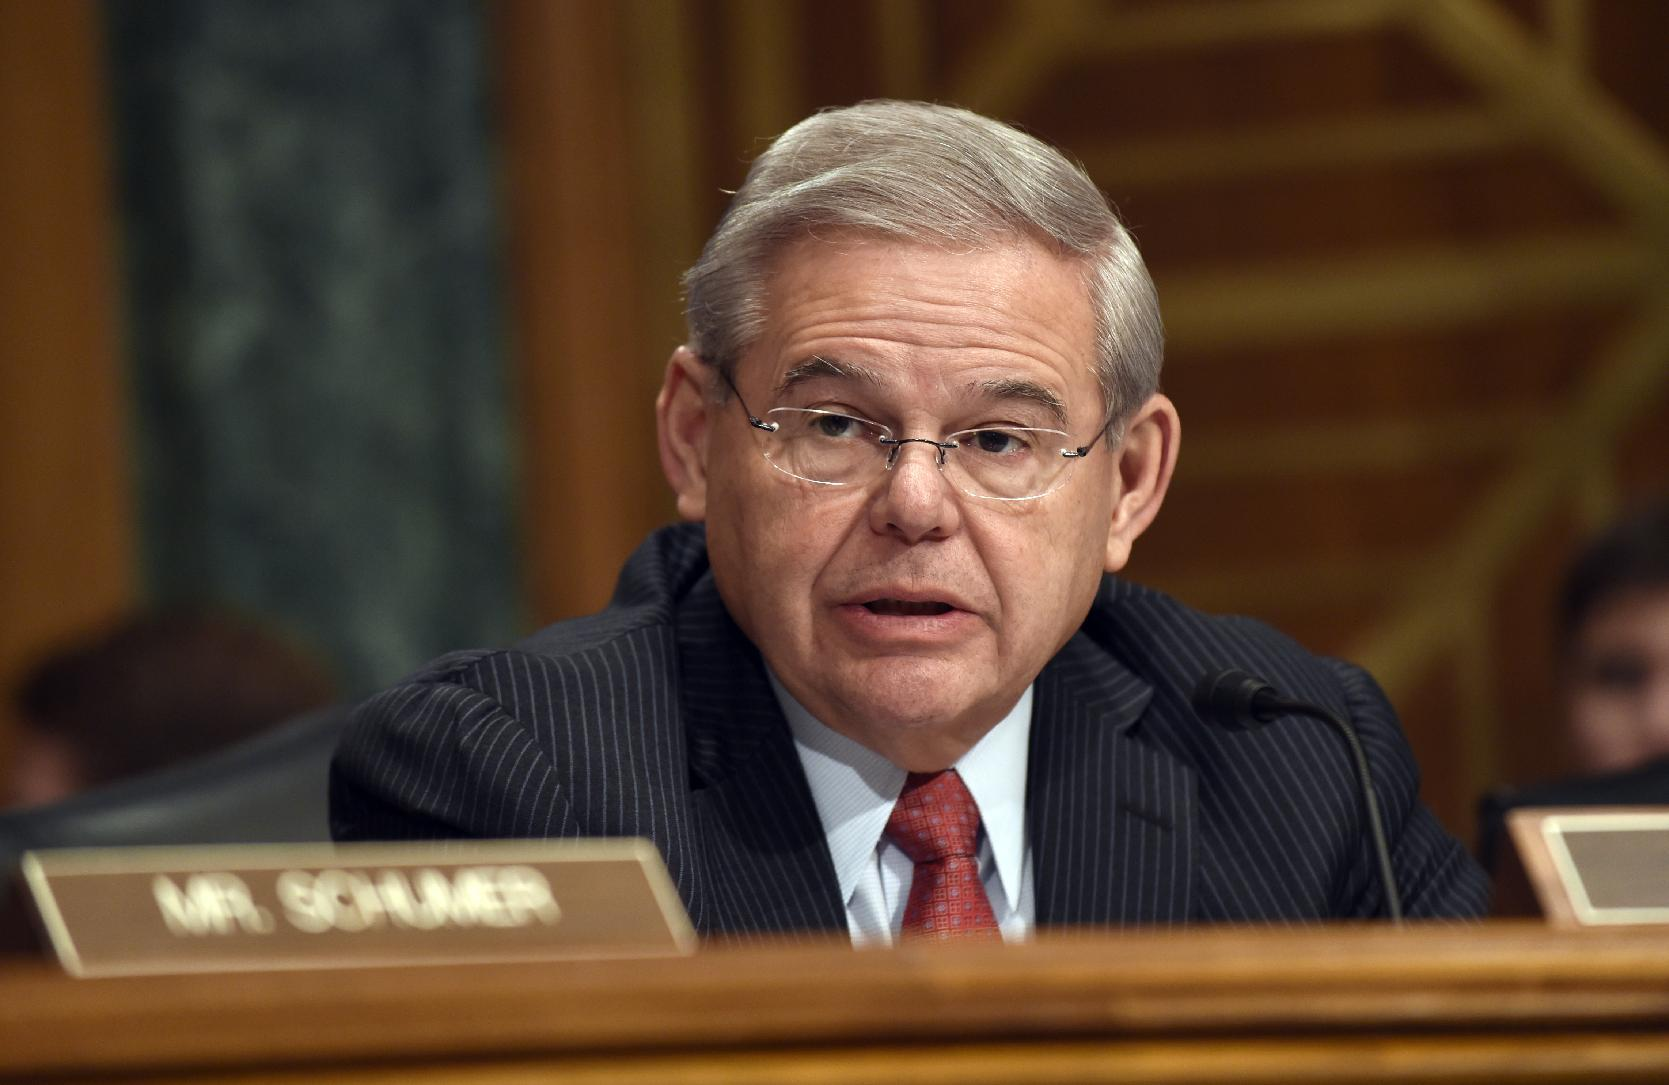 N.J. Sen. Bob Menendez to face criminal corruption charges: reports